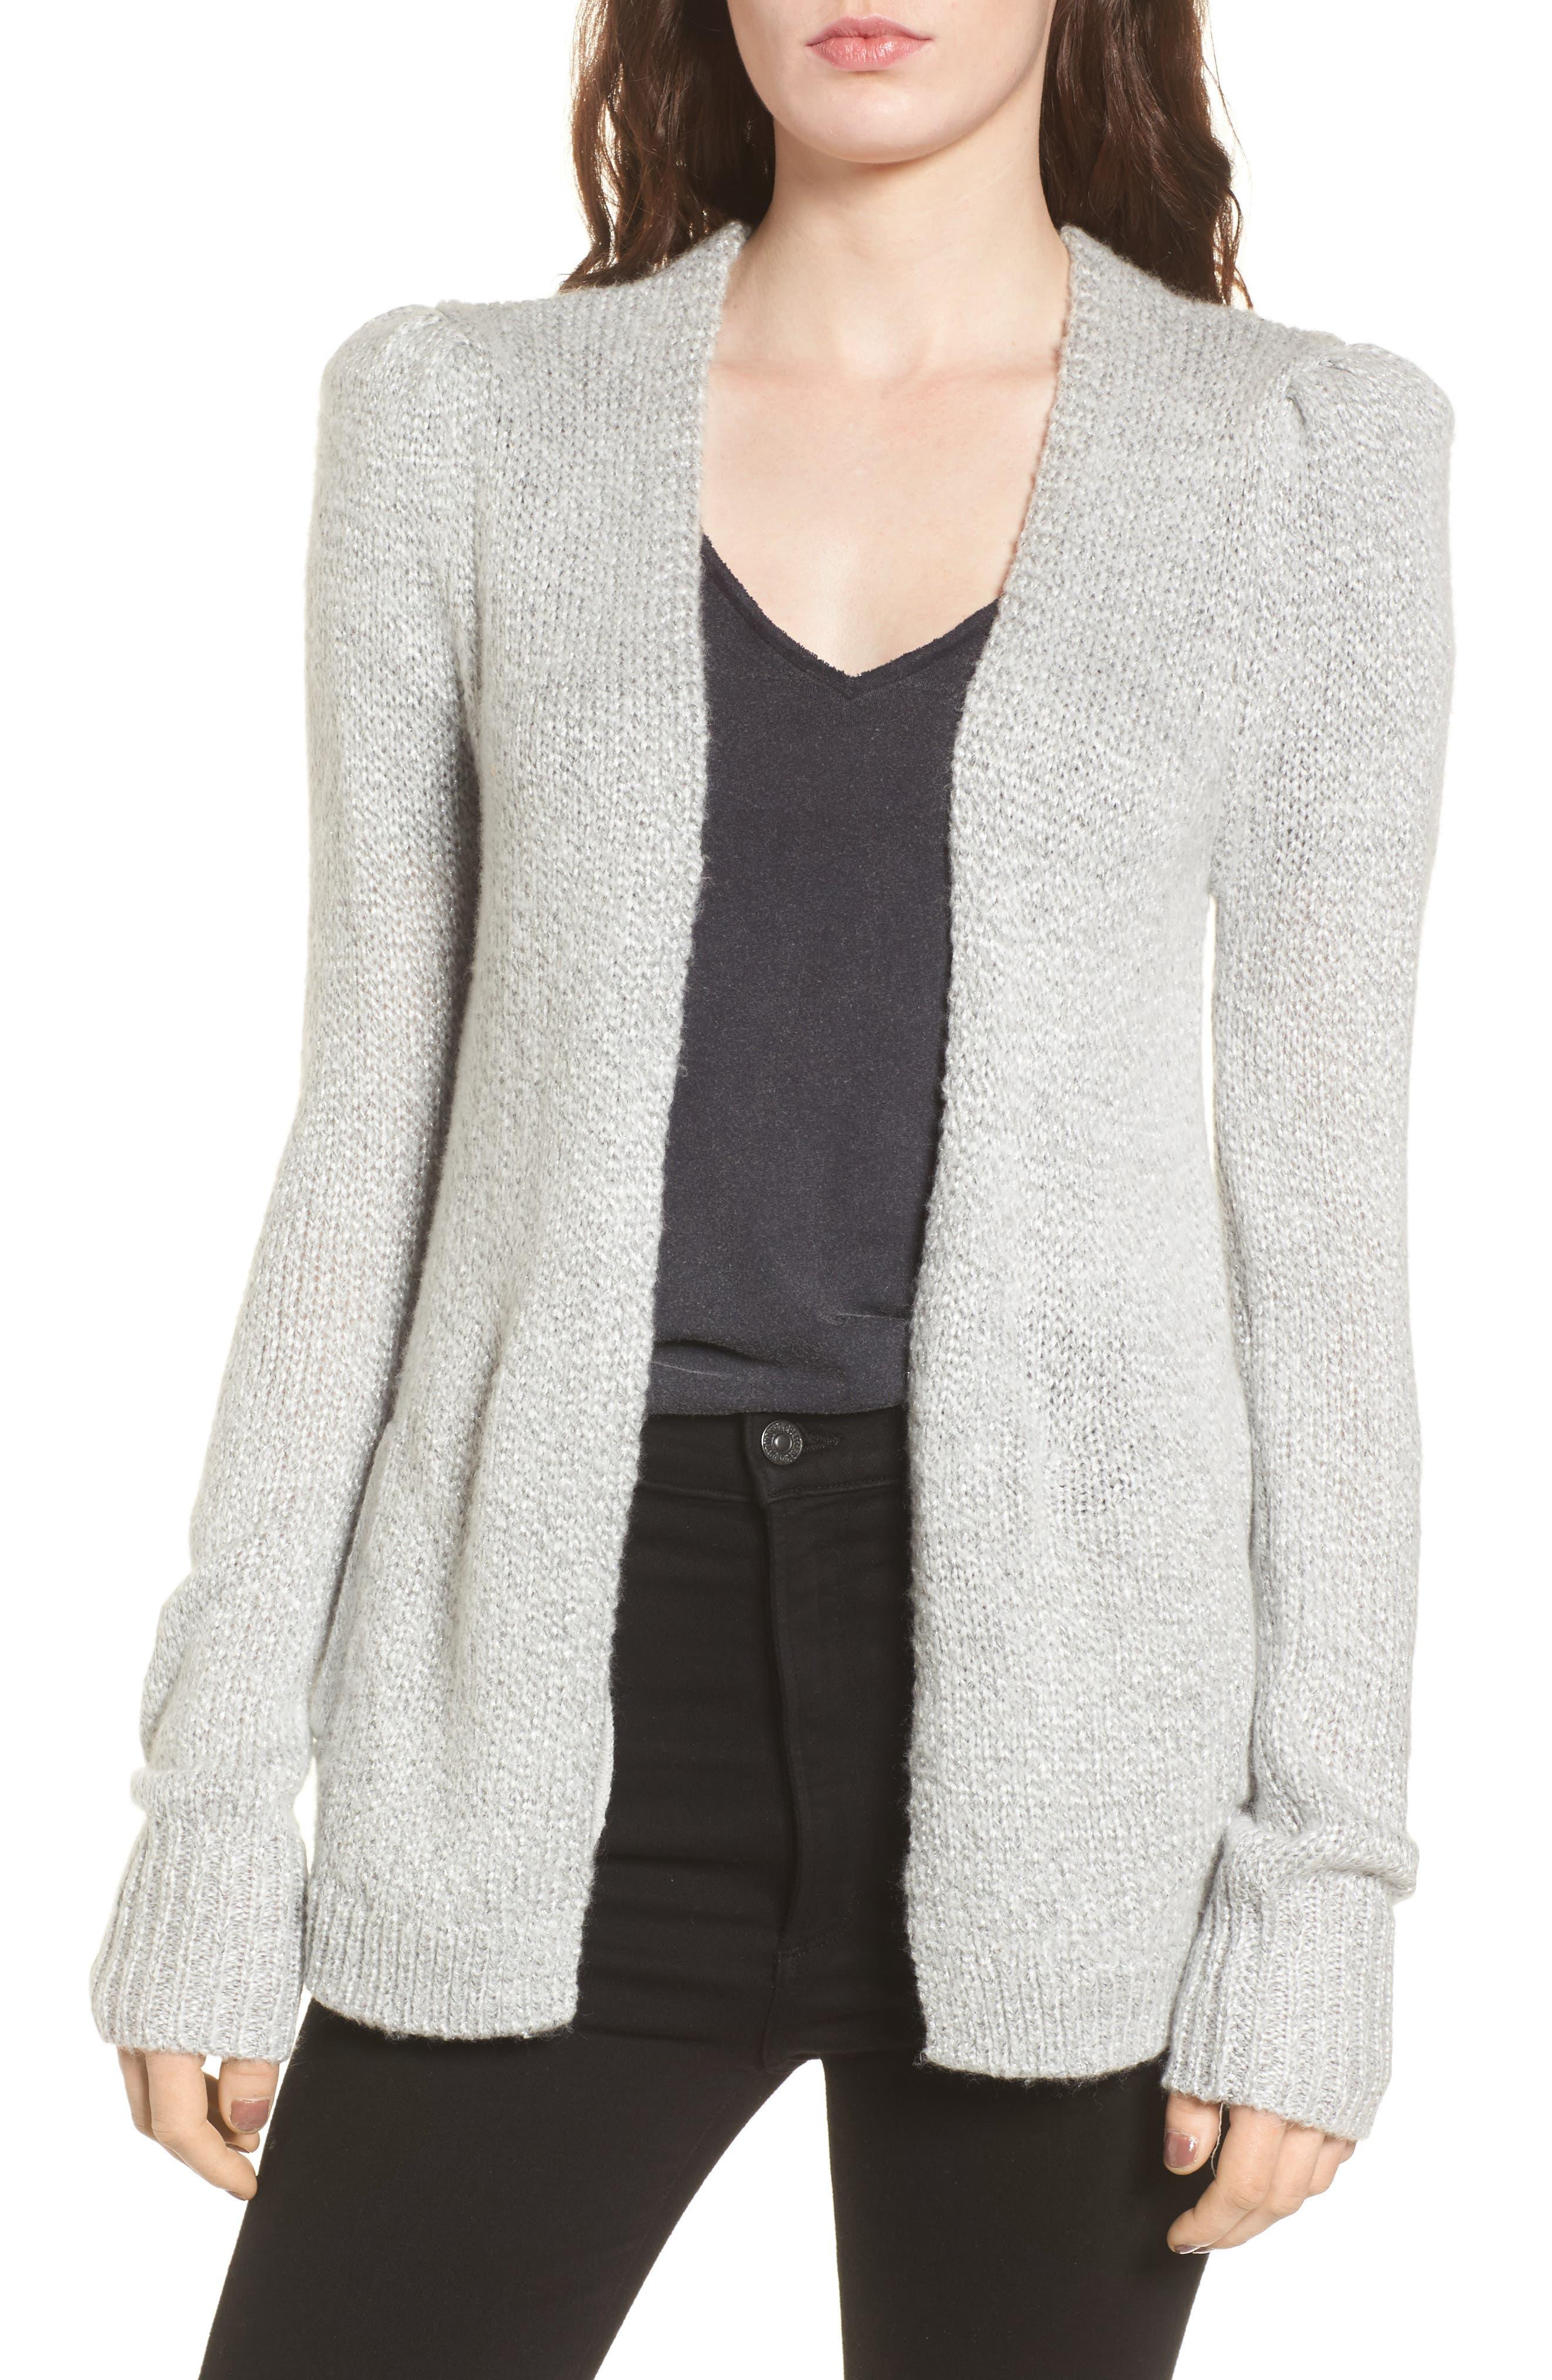 Main Image - Hinge Shine Cardigan Sweater